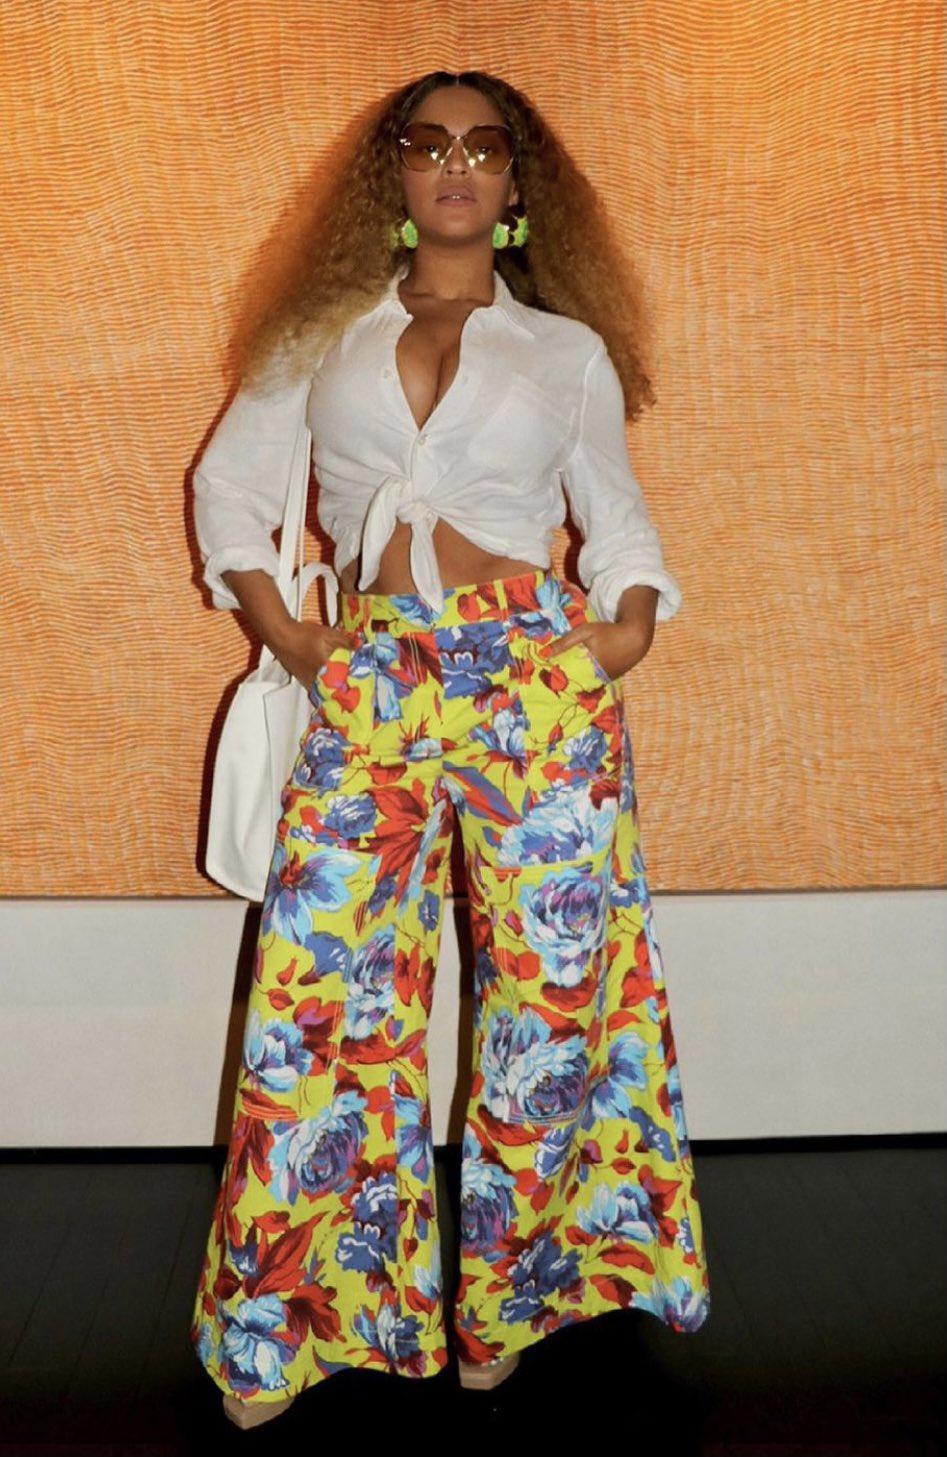 beyonce-wears-christopher-john-rogers-pants-telfar-bag-in-brooklyn-ny